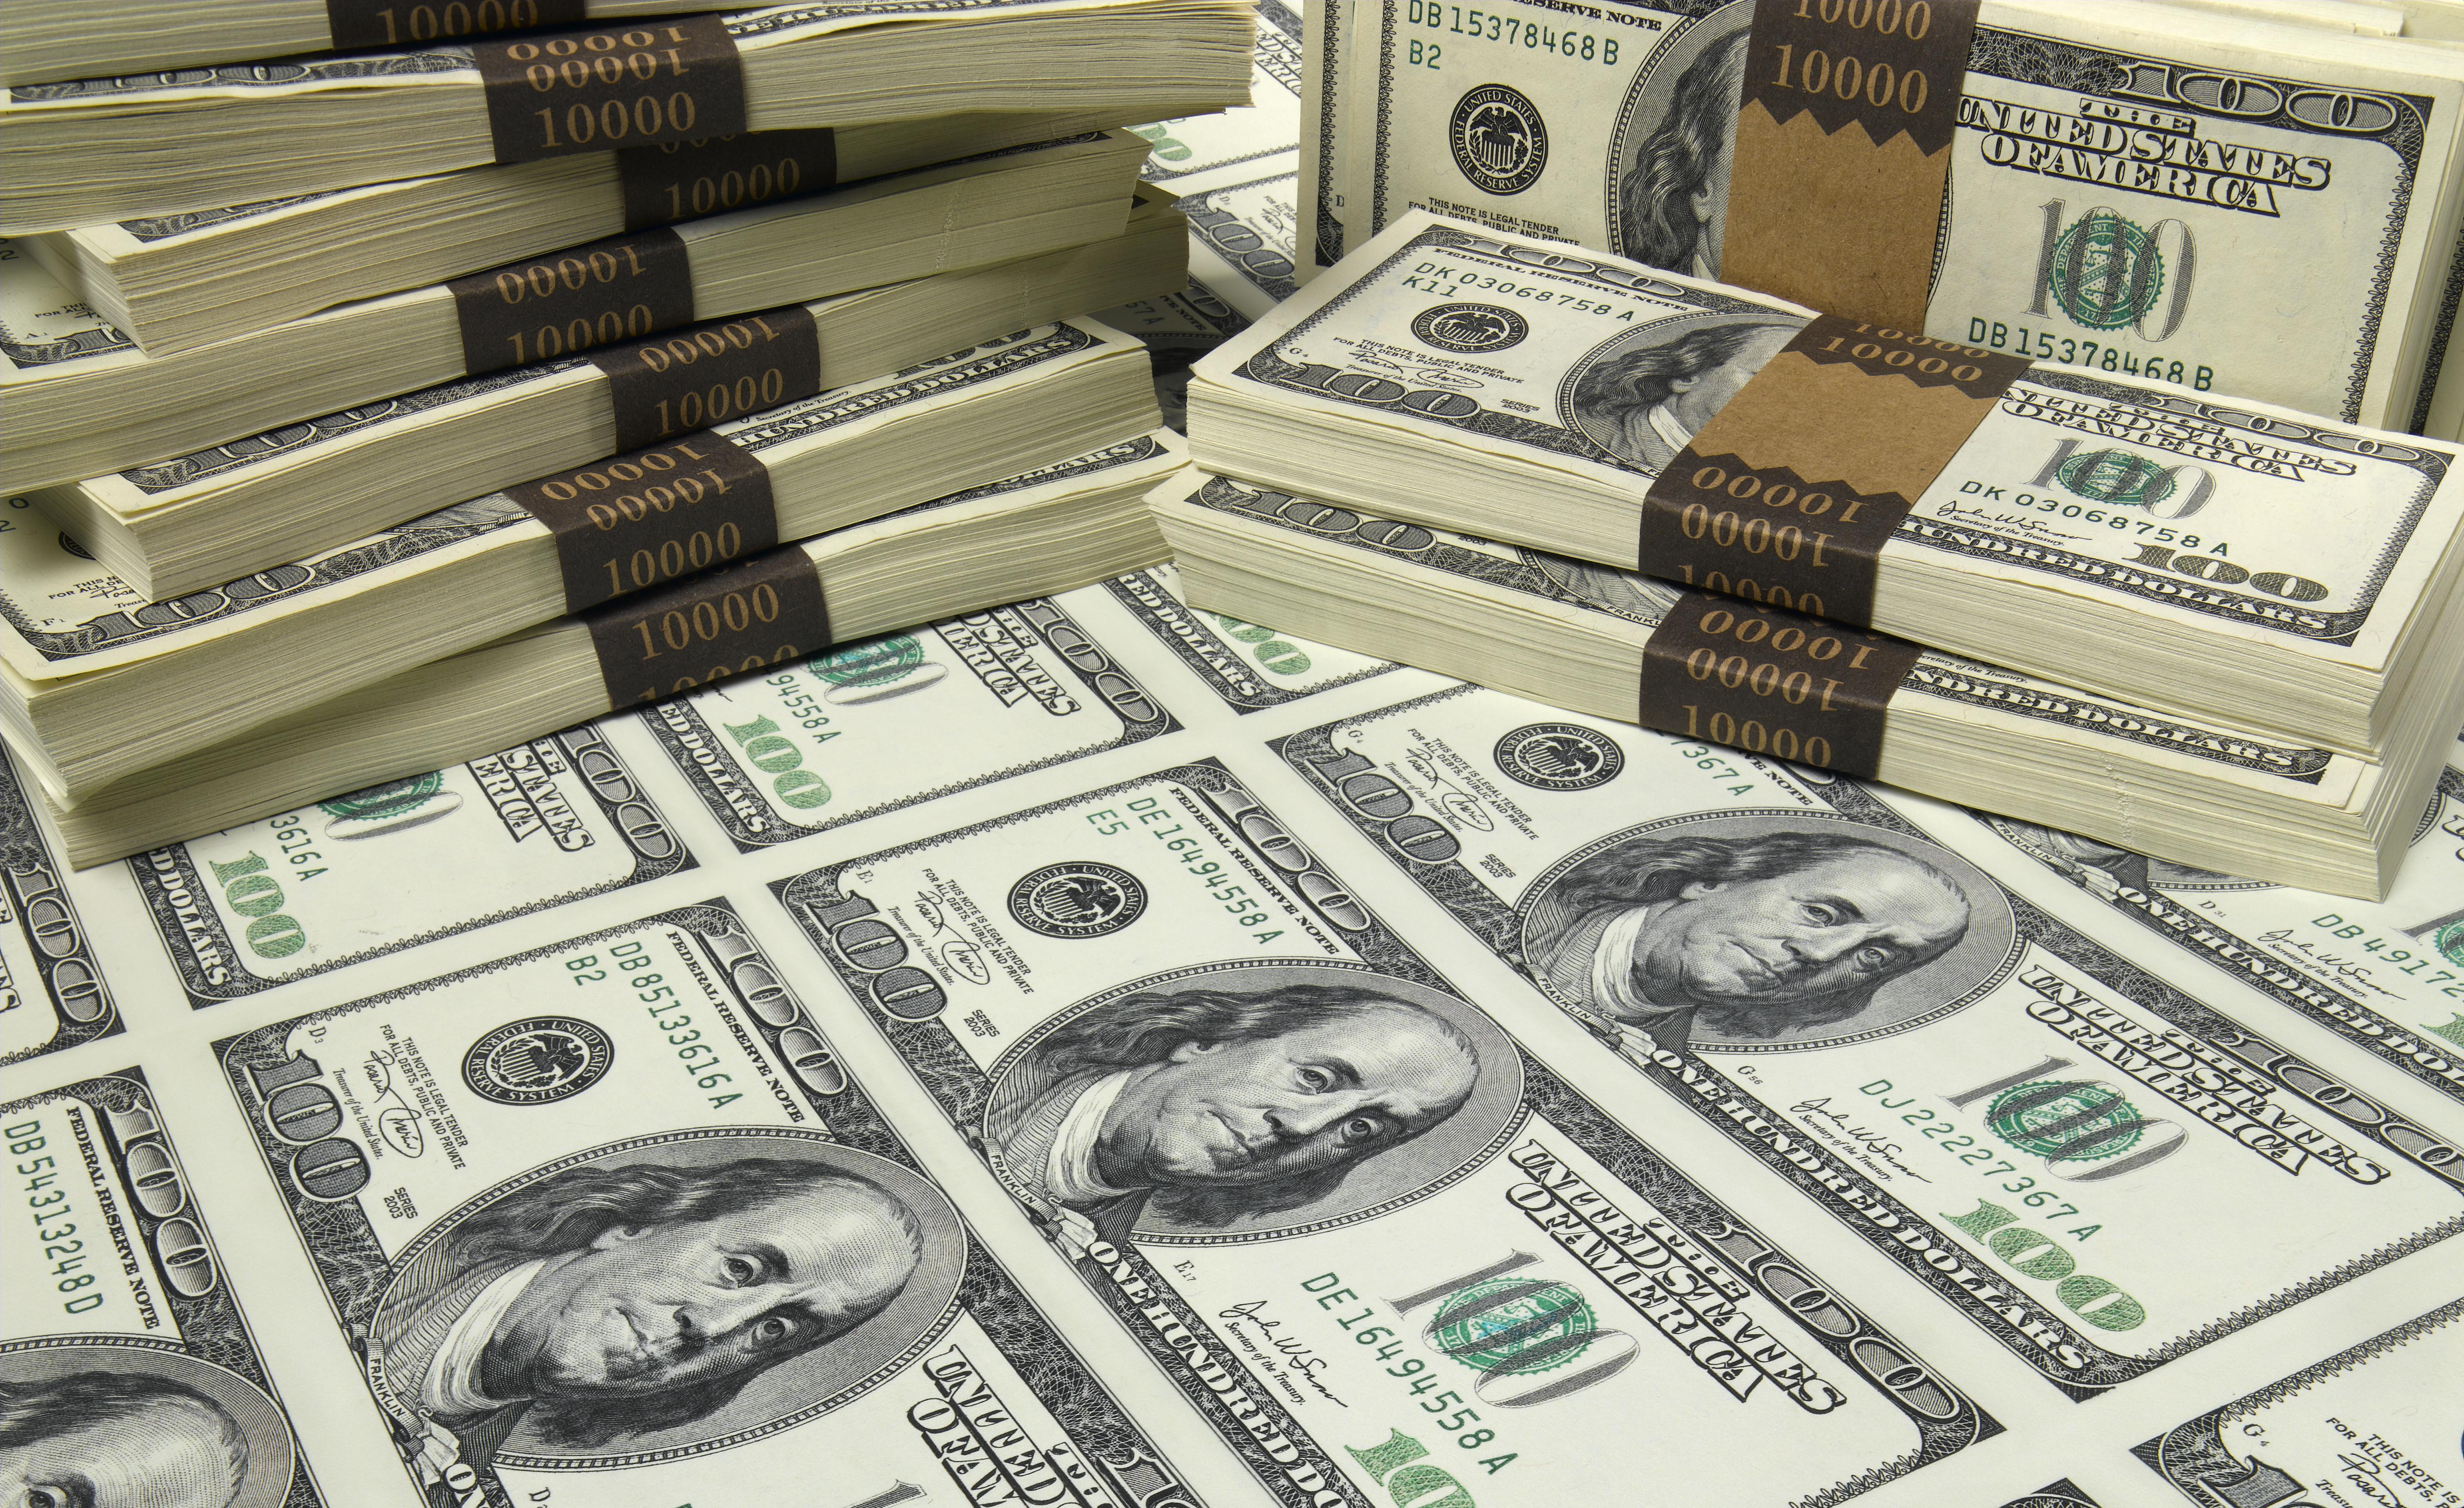 Stacks of 100-dollar bills